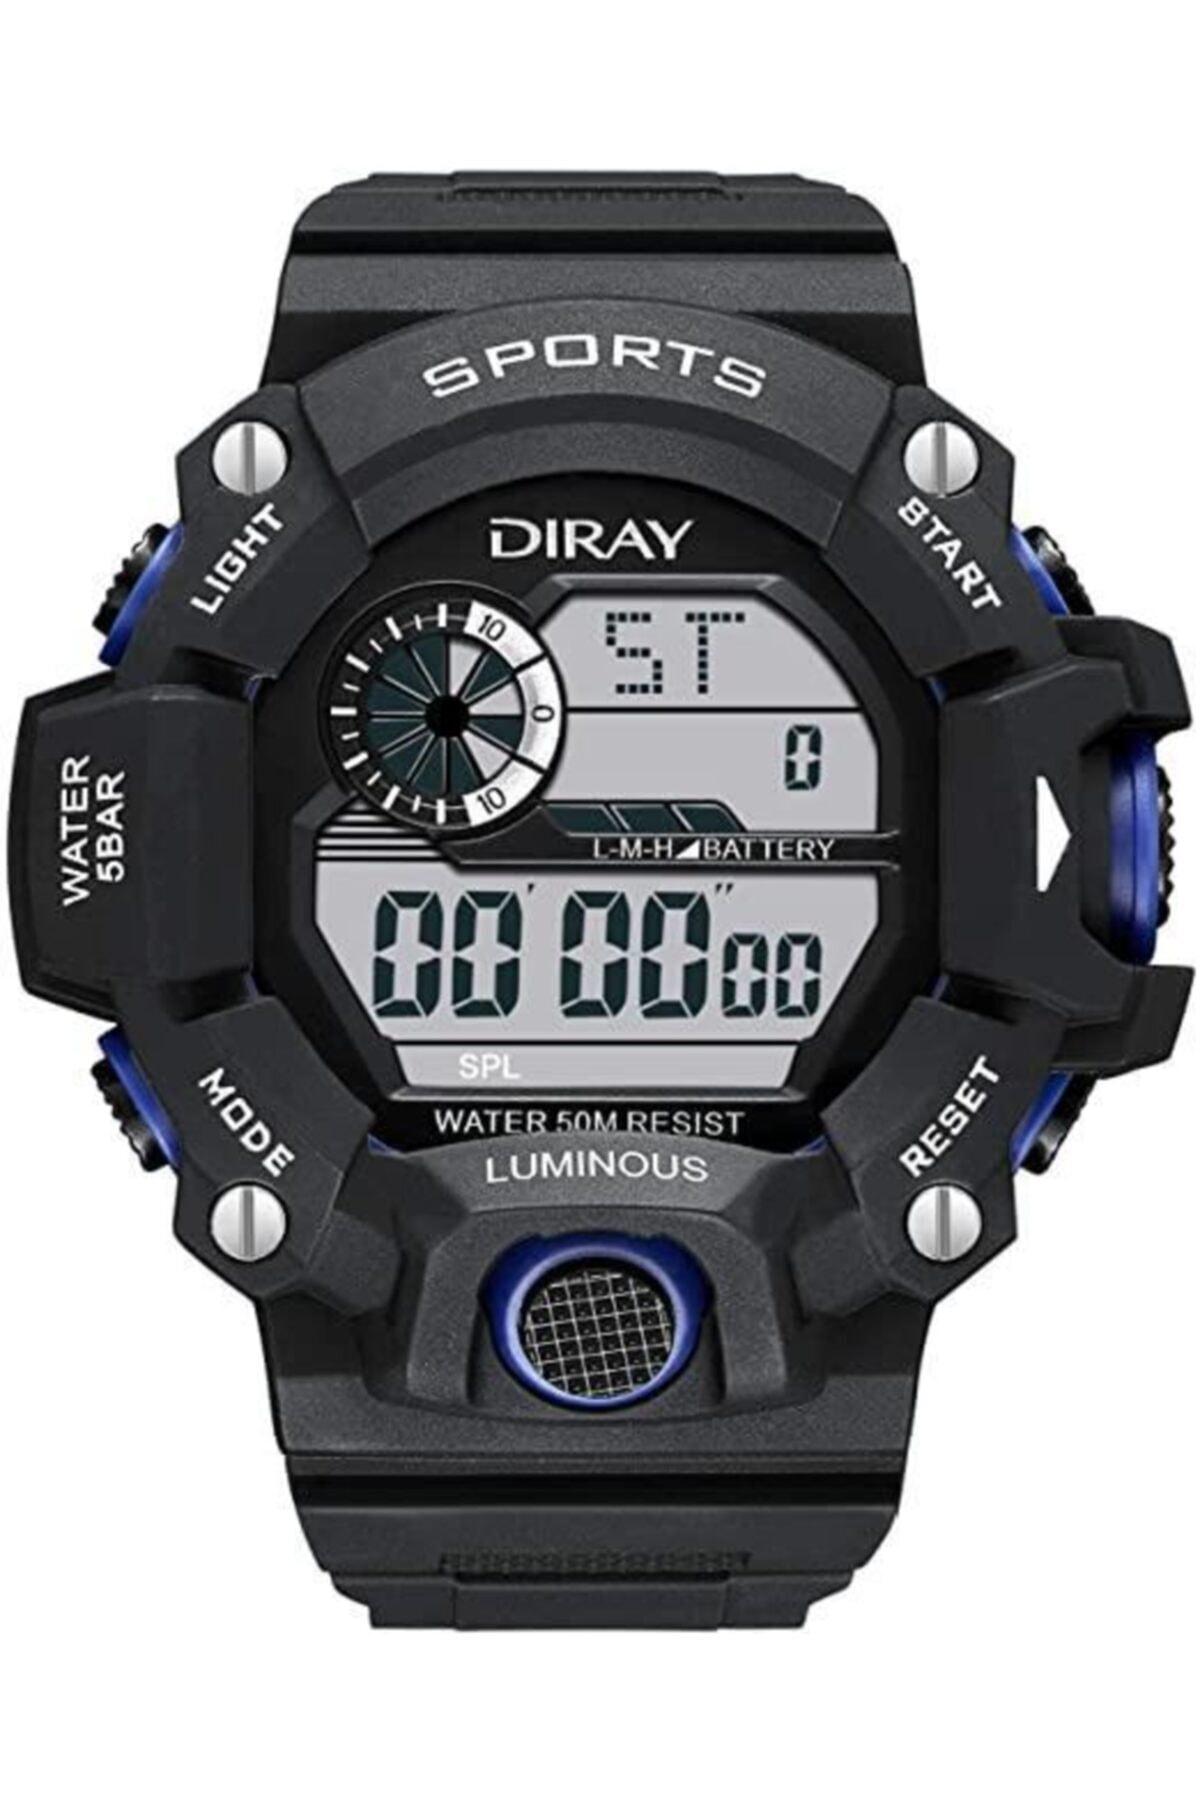 DIRAY Su Geçirmez Işıklı Sporcu Asker Kol Saati Mavi 1